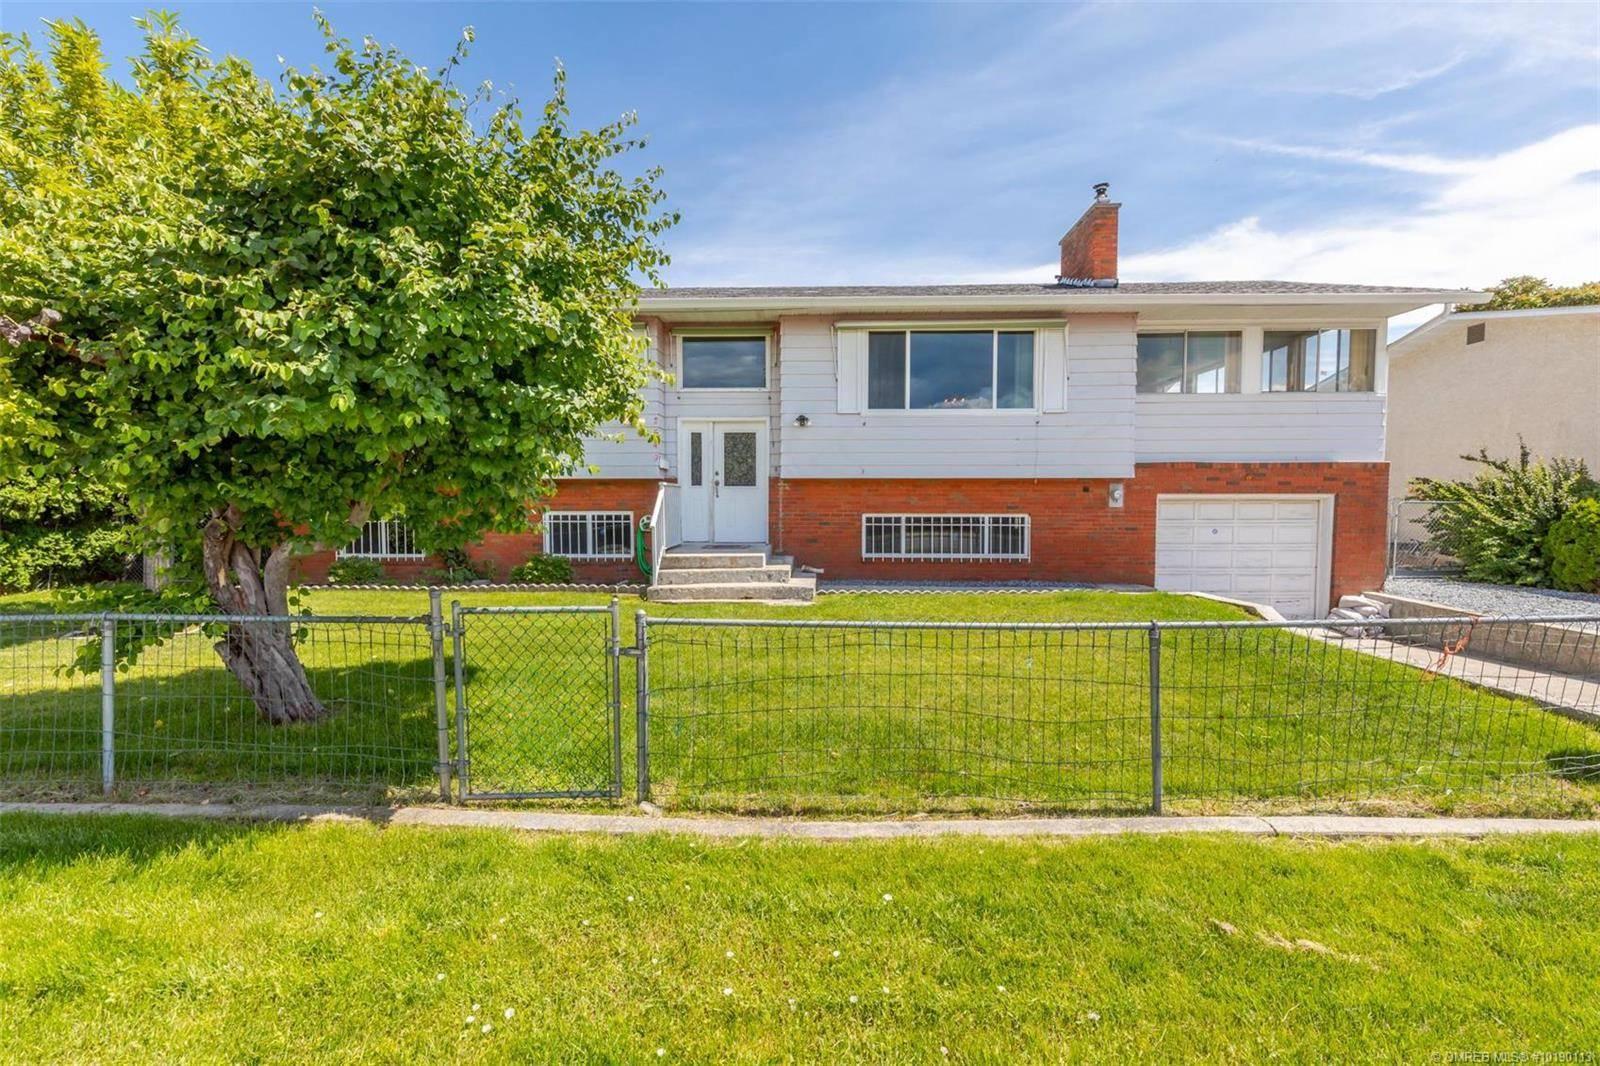 House for sale at 2549 Ethel St Kelowna British Columbia - MLS: 10190113